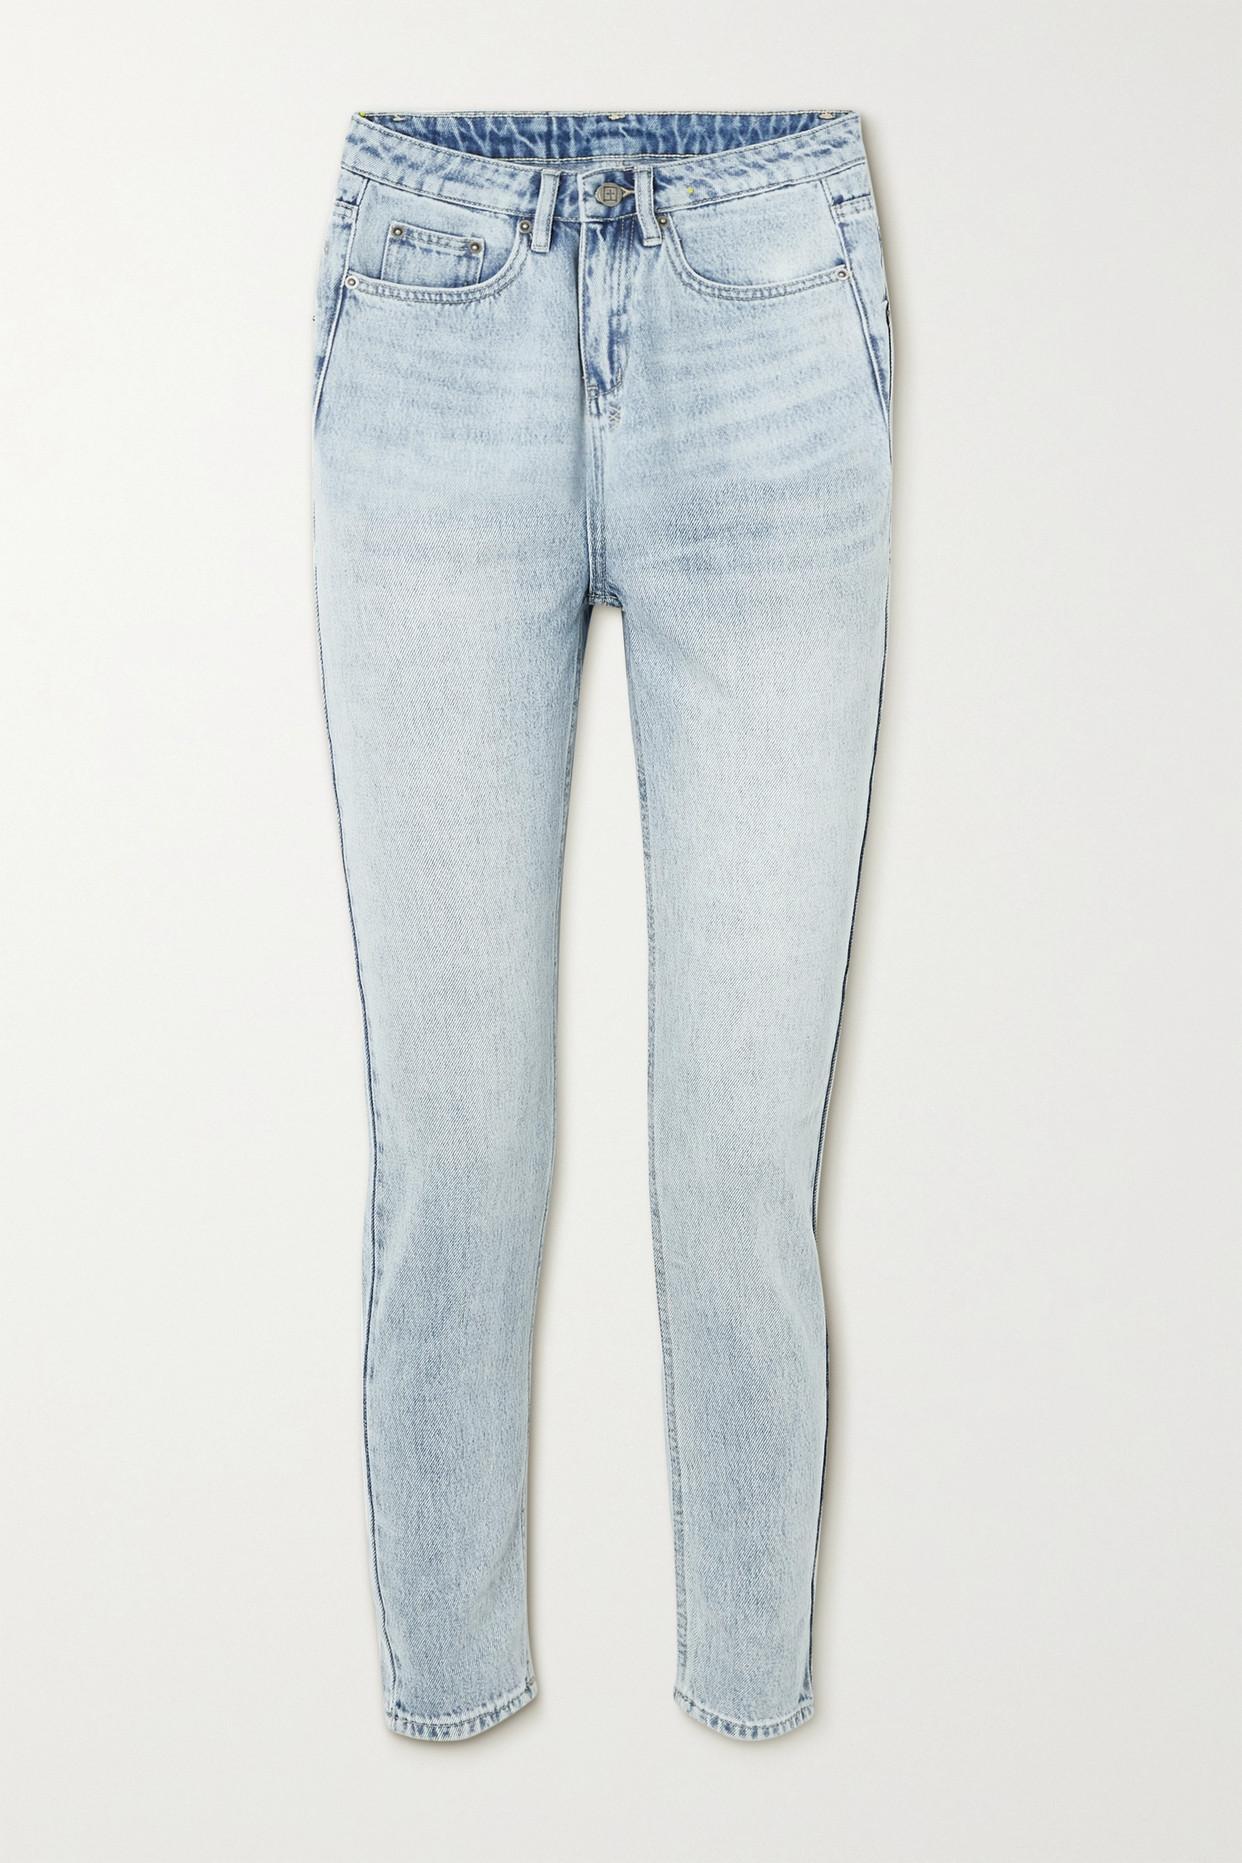 KSUBI - Nine O Cropped High-rise Slim-leg Jeans - Blue - 27